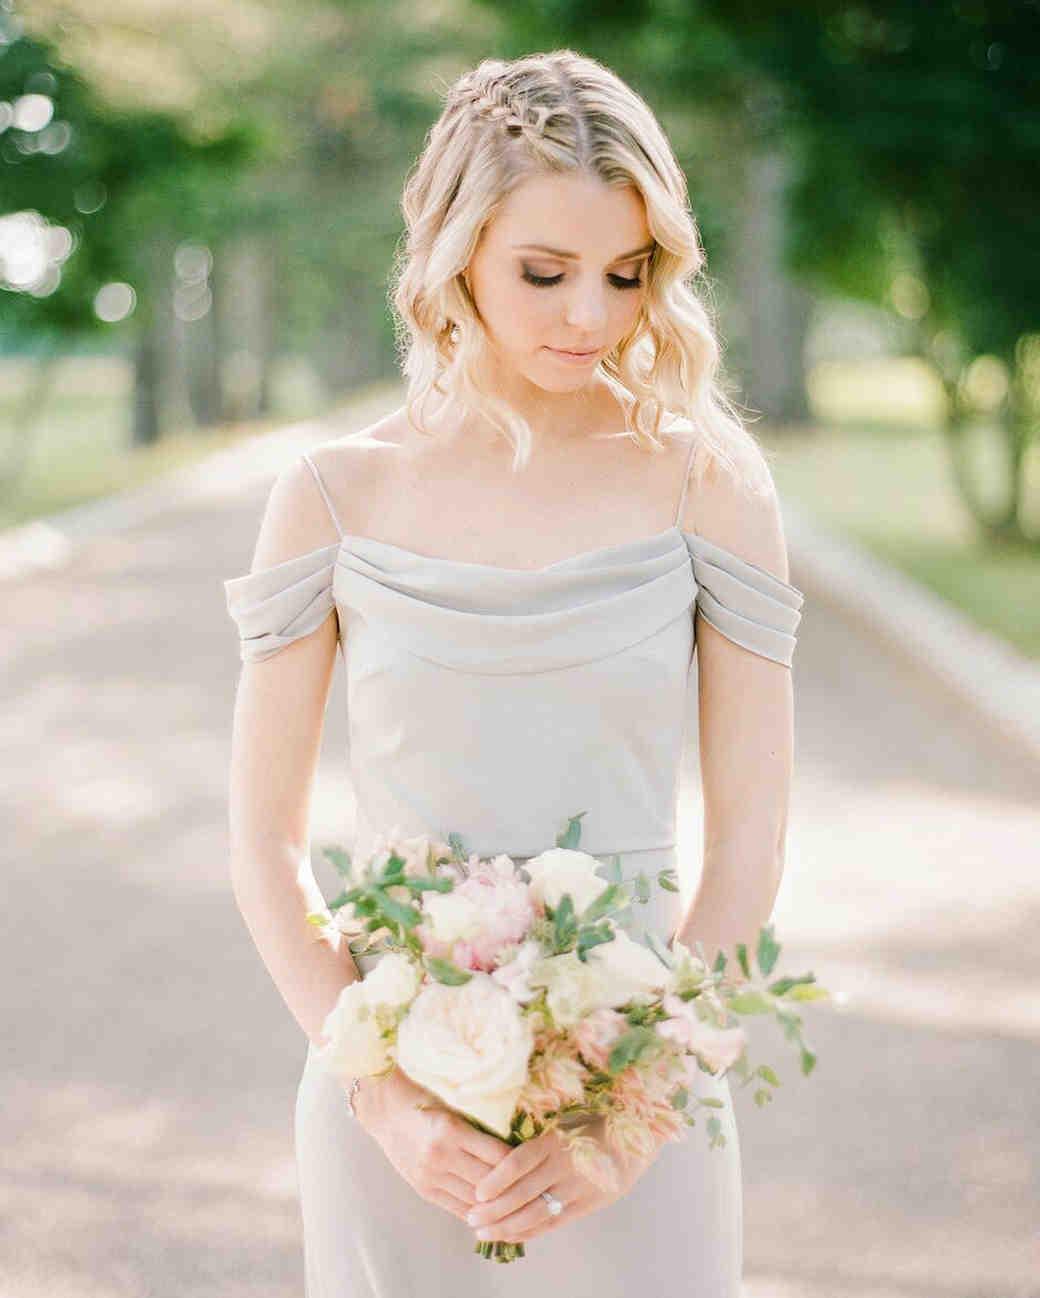 Bridesmaid dresses short 2018 hairstyles